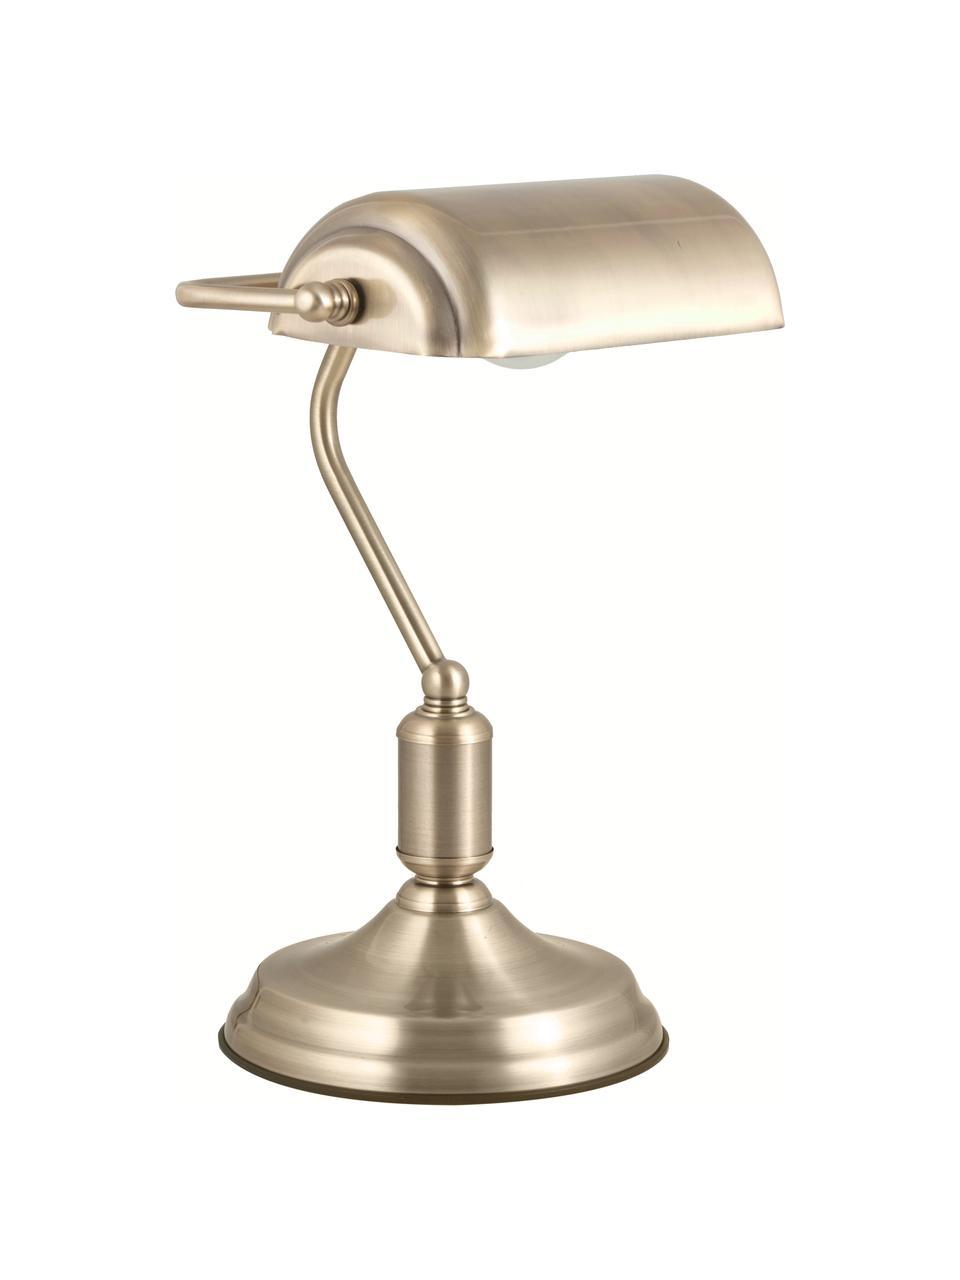 Lampada da tavolo in metallo Bank, Paralume: metallo rivestito, Base della lampada: metallo rivestito, Ottonato, Larg. 22 x Alt. 34 cm